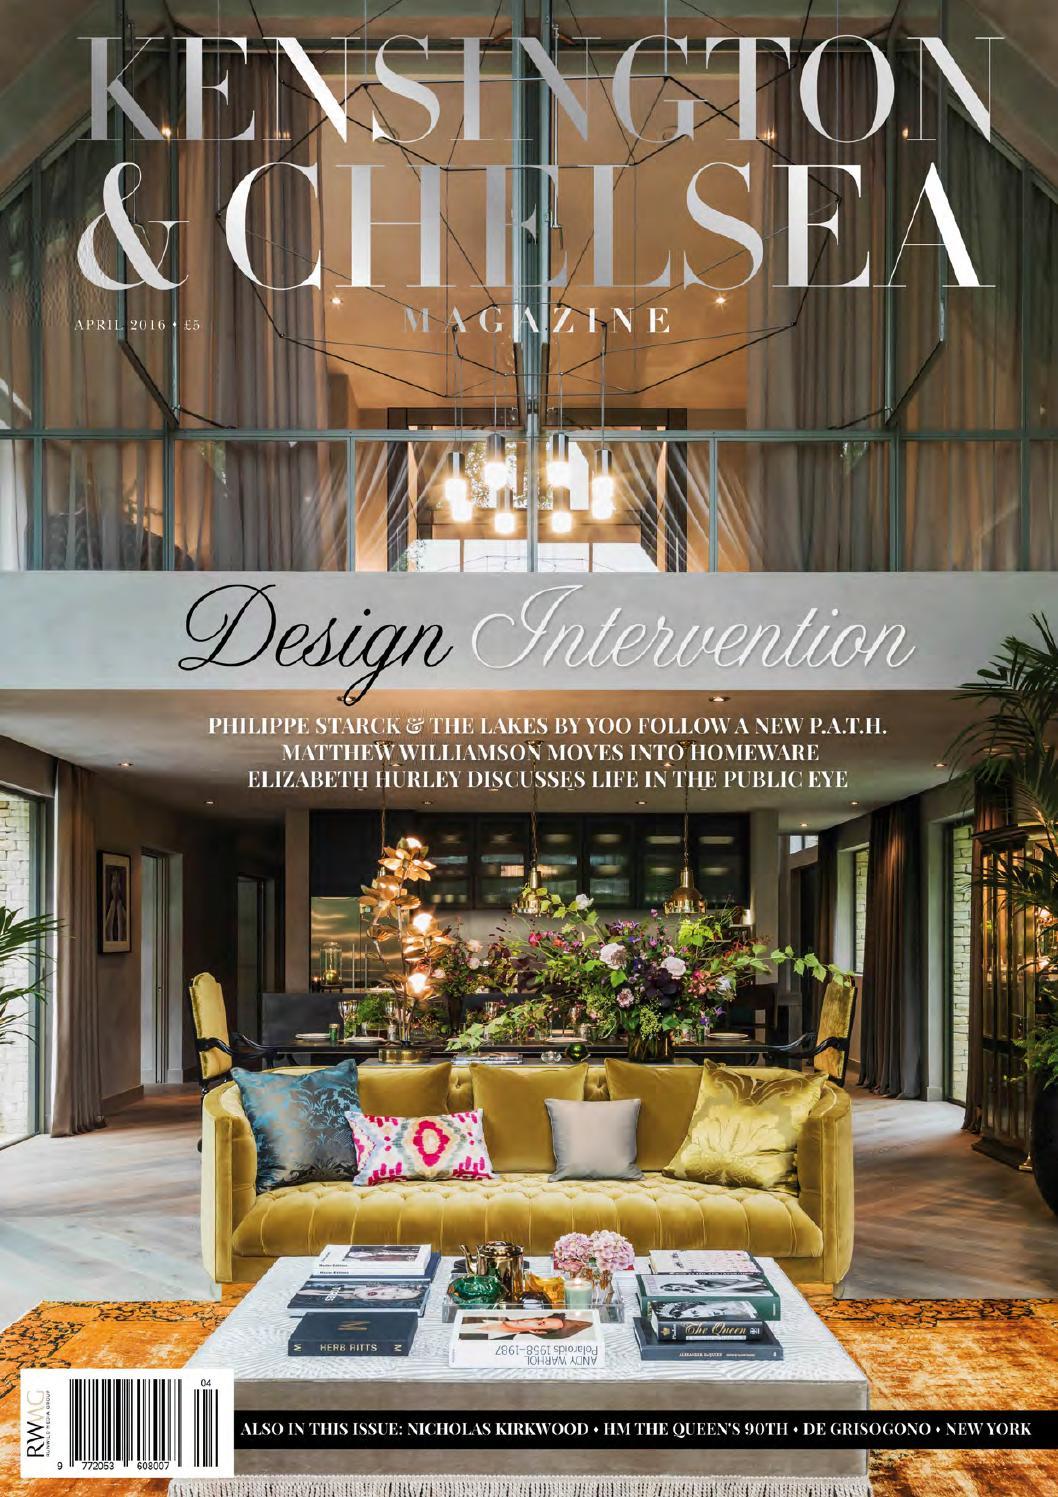 The Kensington   Chelsea Magazine April 2016 by Runwild Media Group ... 20f7eb32e68